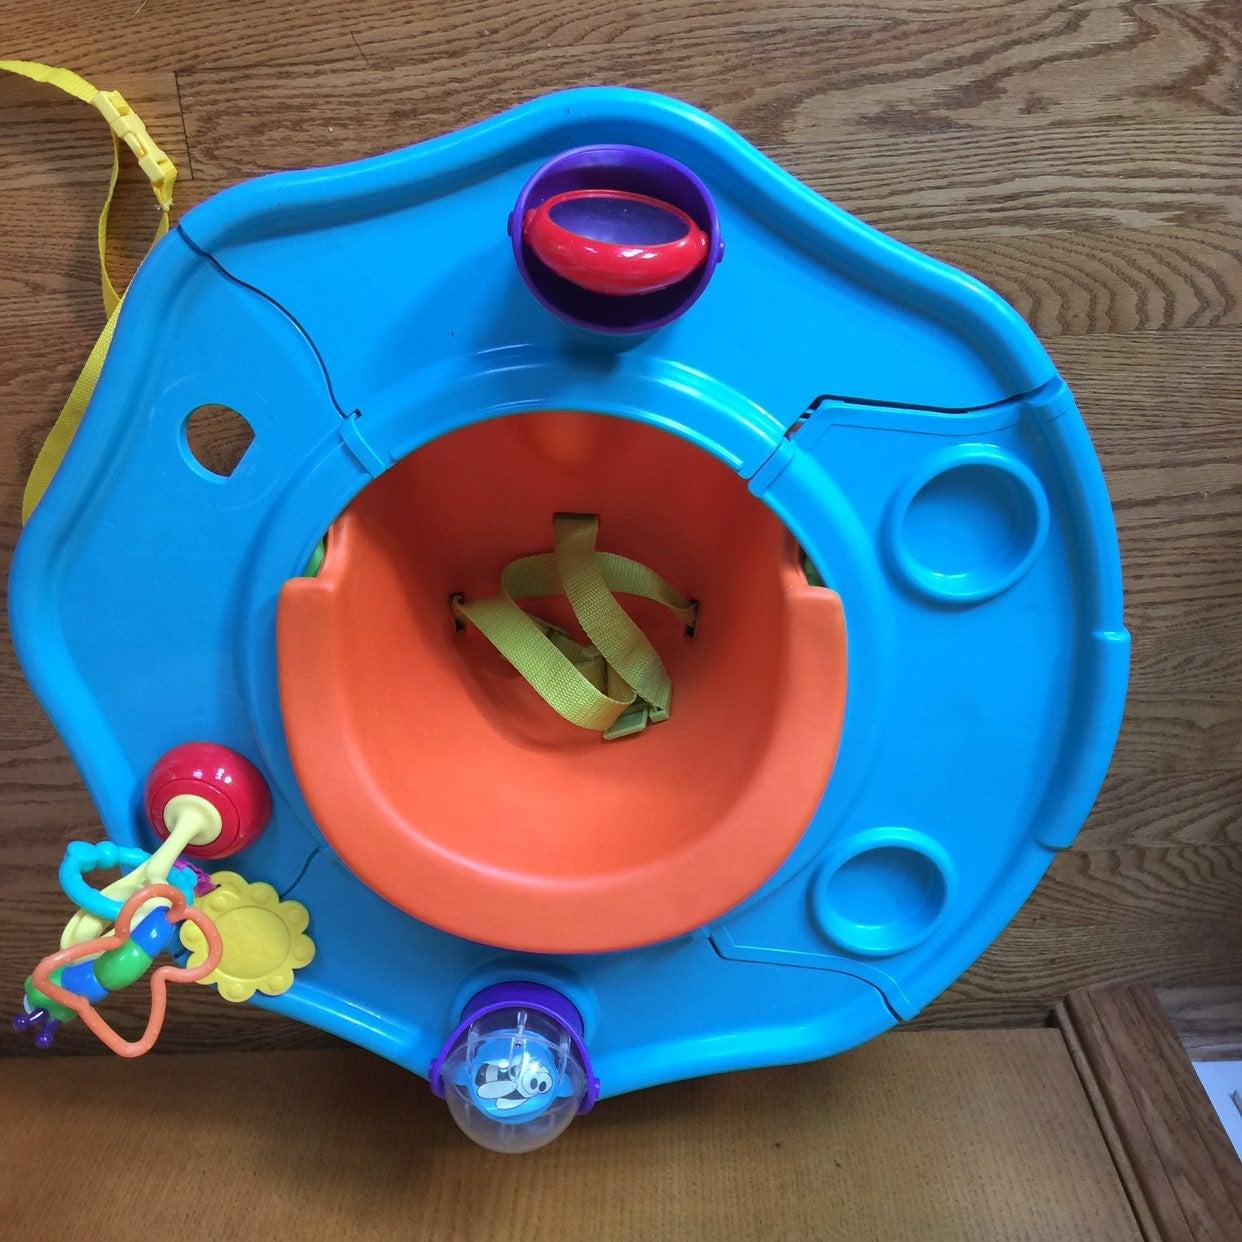 Summer Infant Deluxe Super Seat